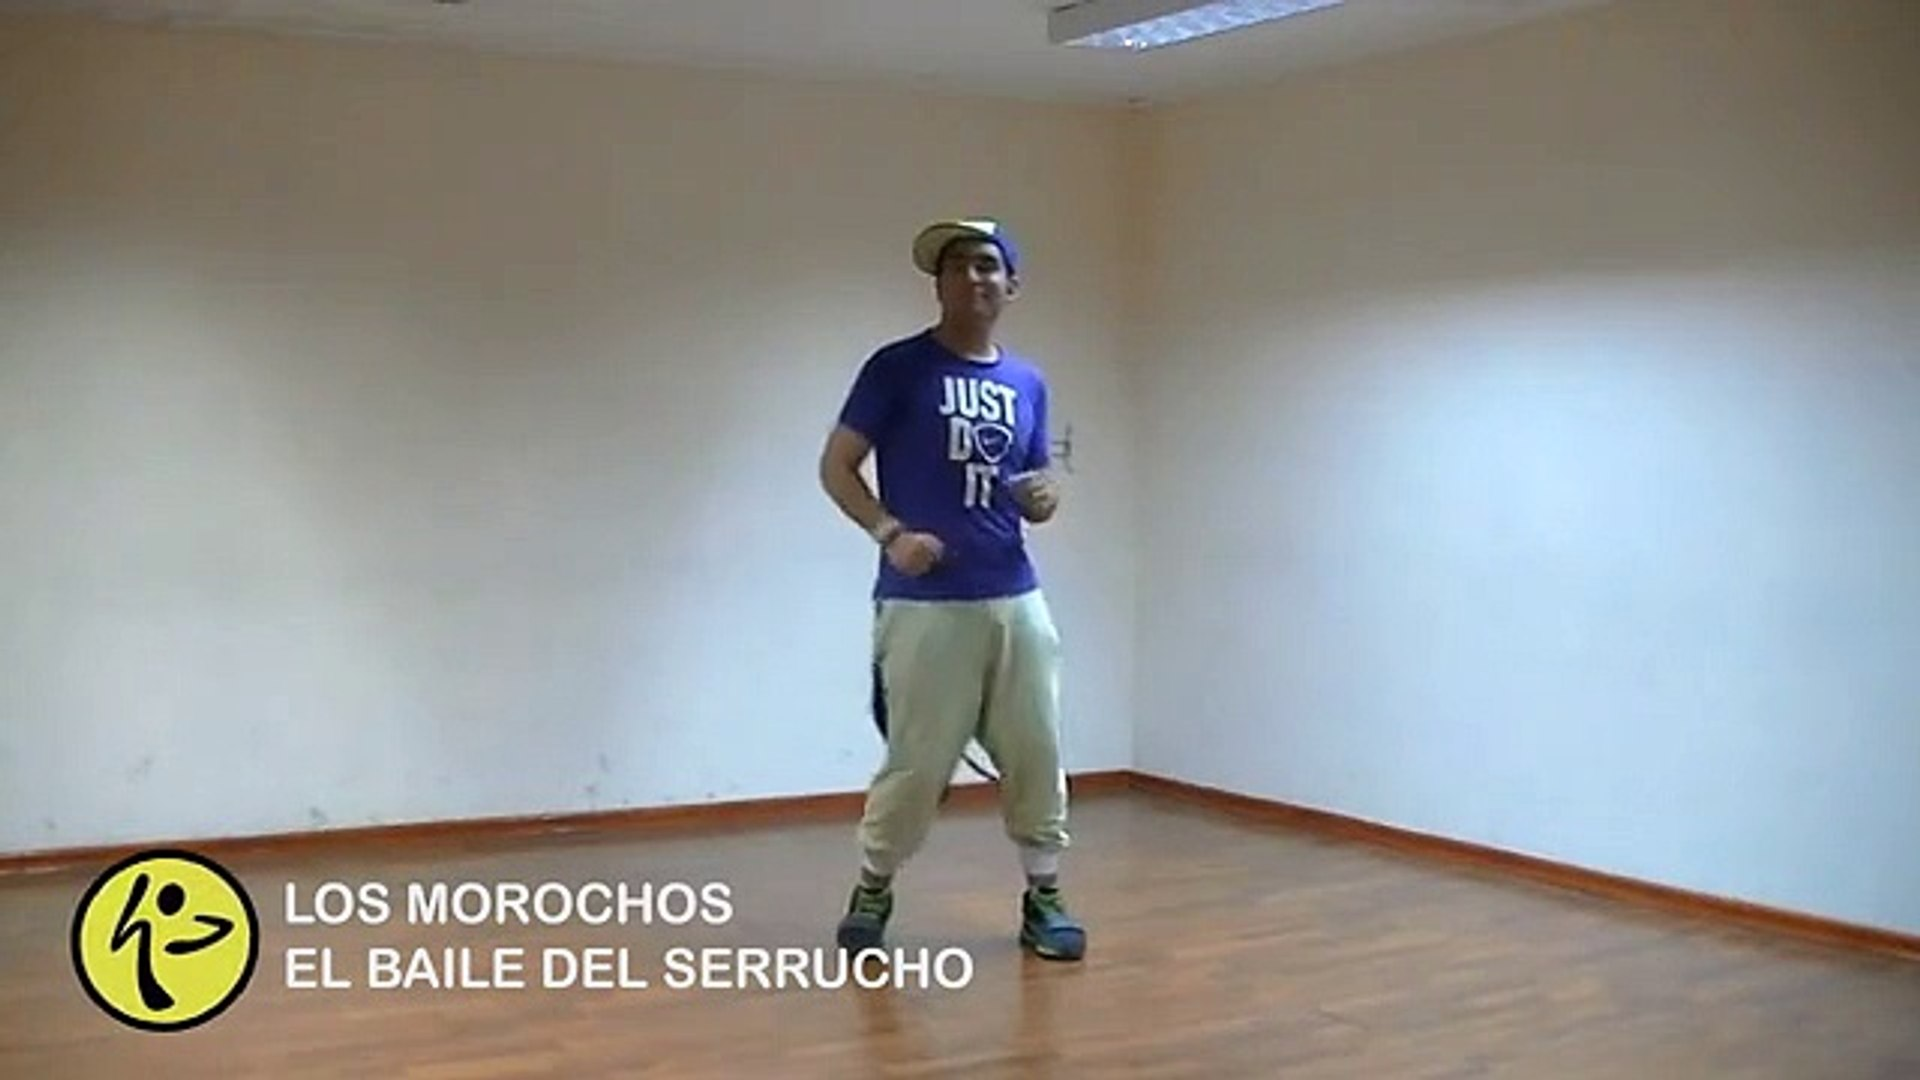 Garylais Zumba Chile - El Baile del Serrucho